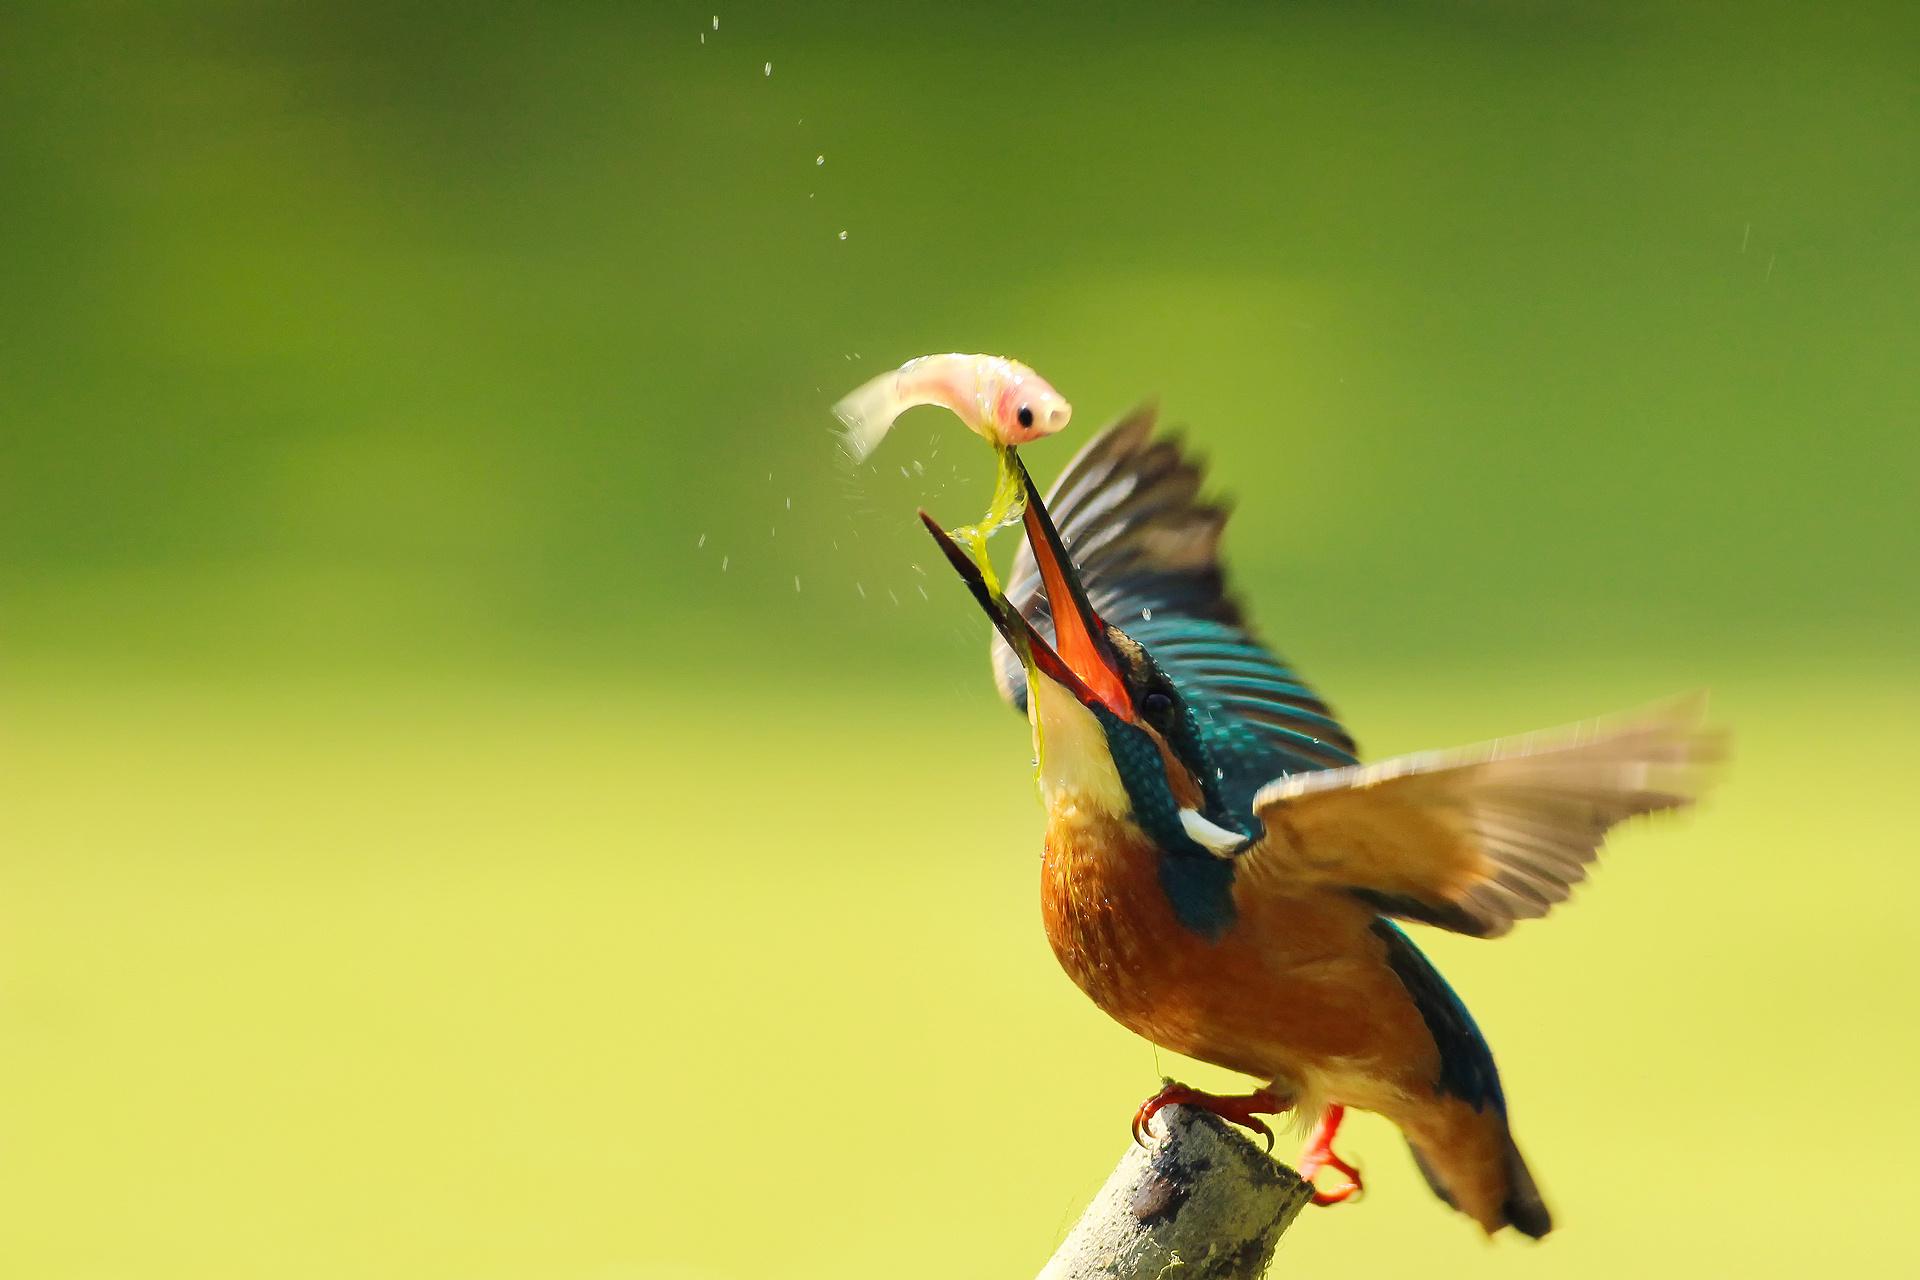 Pájaro pescando - 1920x1280